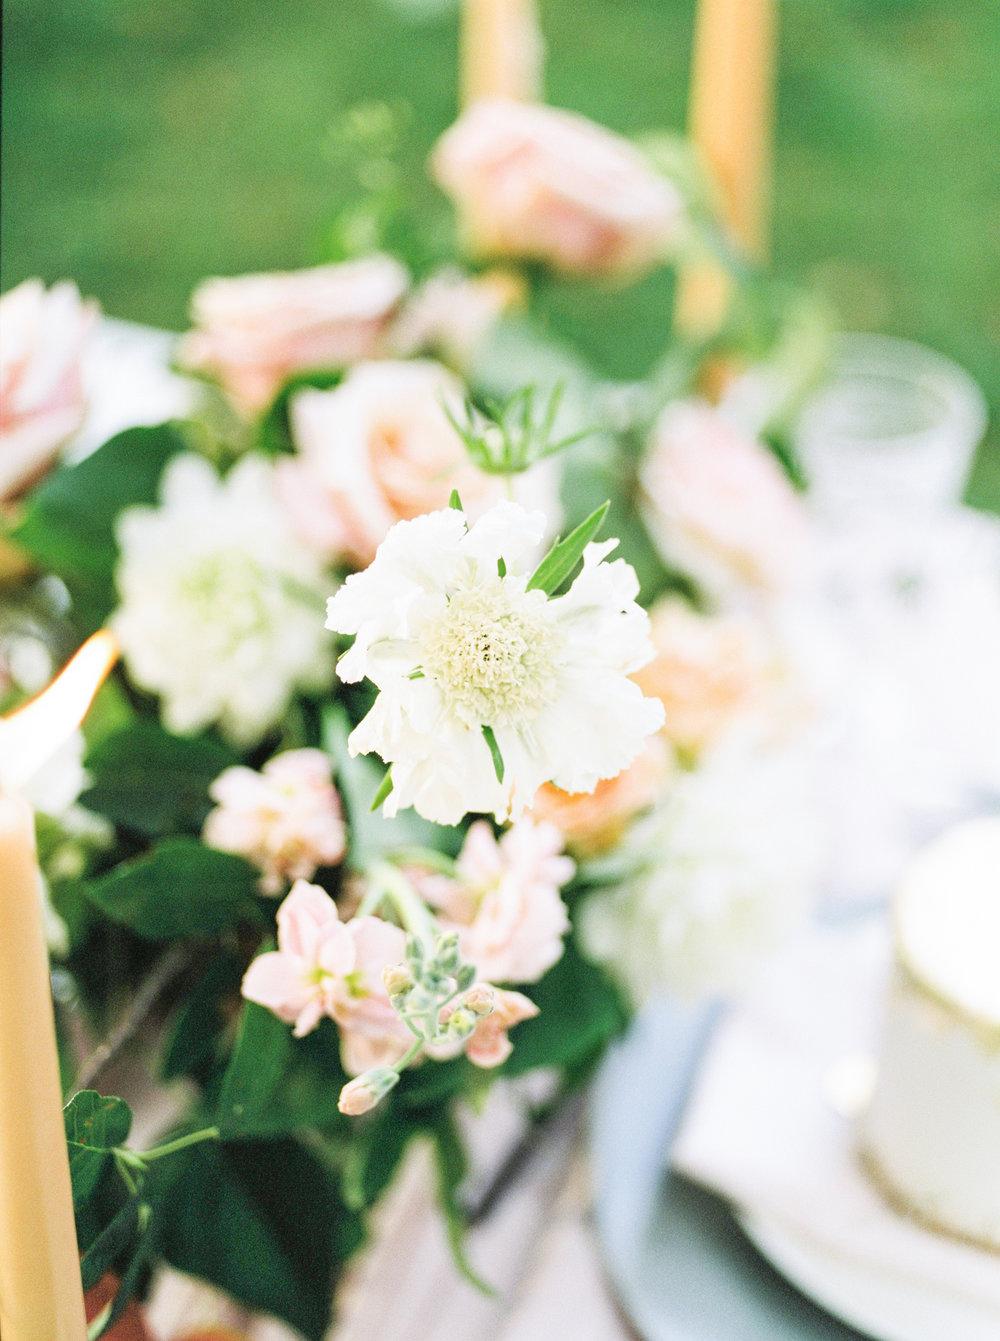 floral wedding centrepiece inspiration